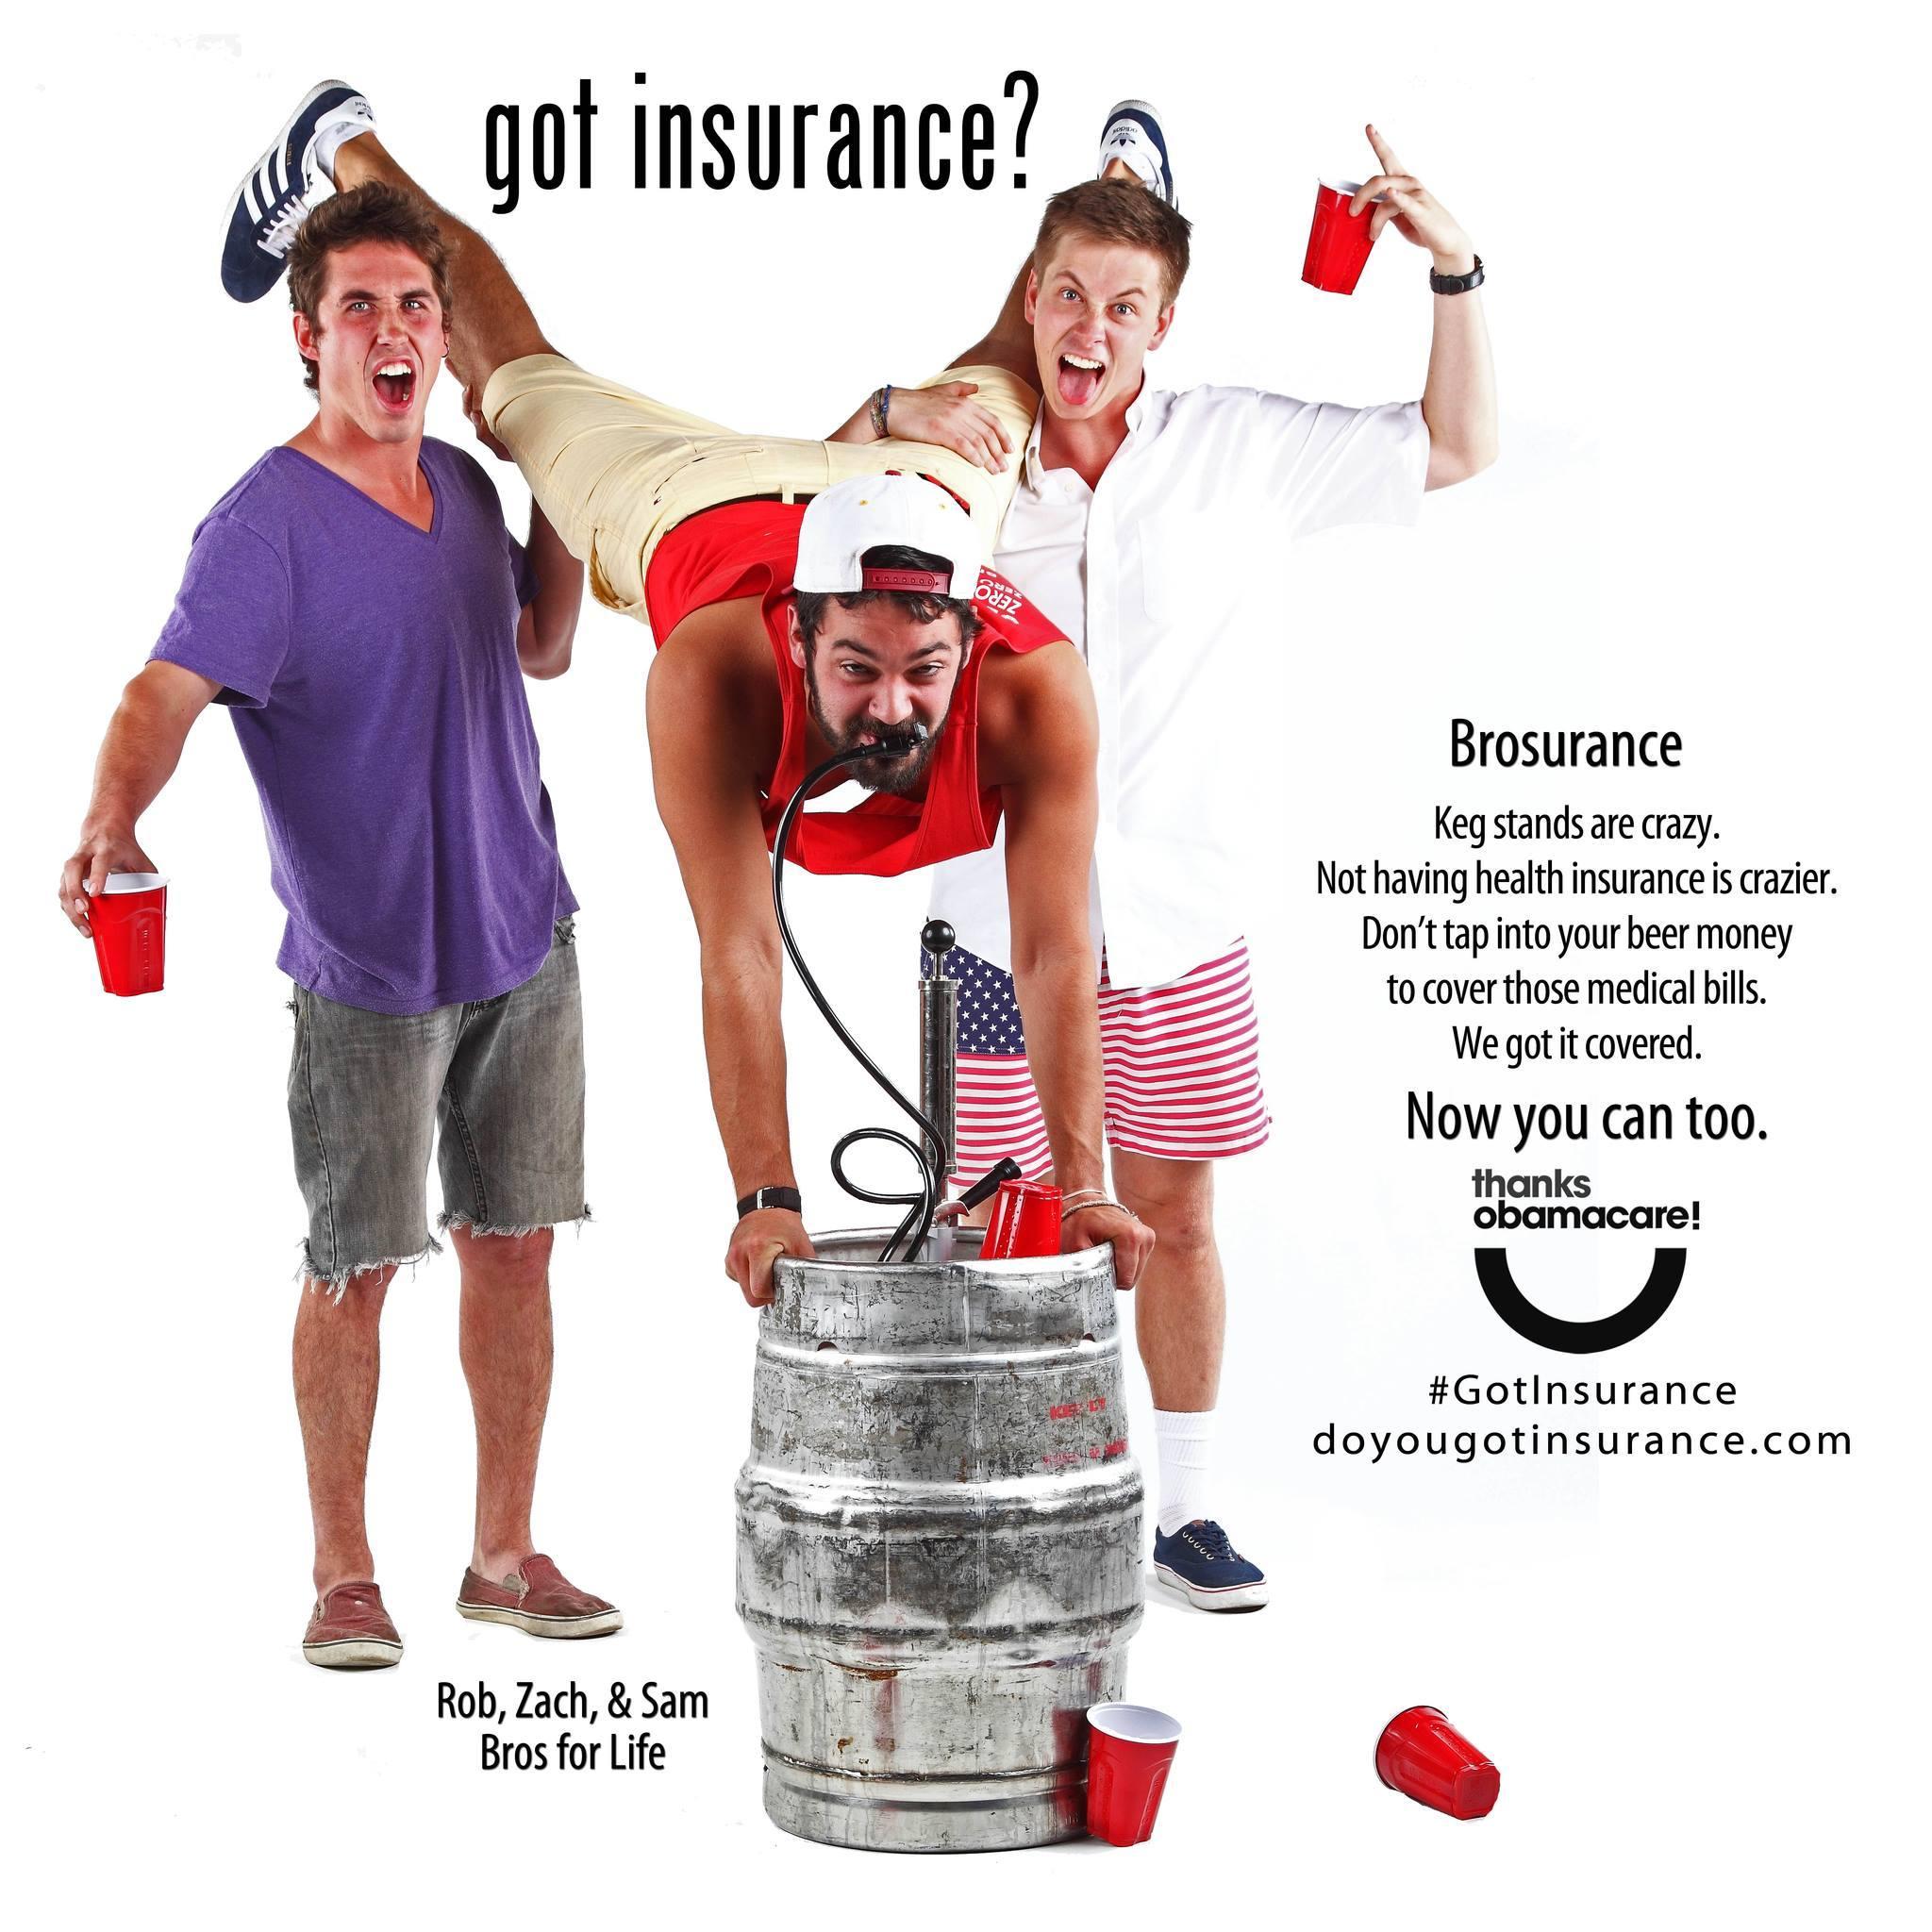 brosurance obamacare